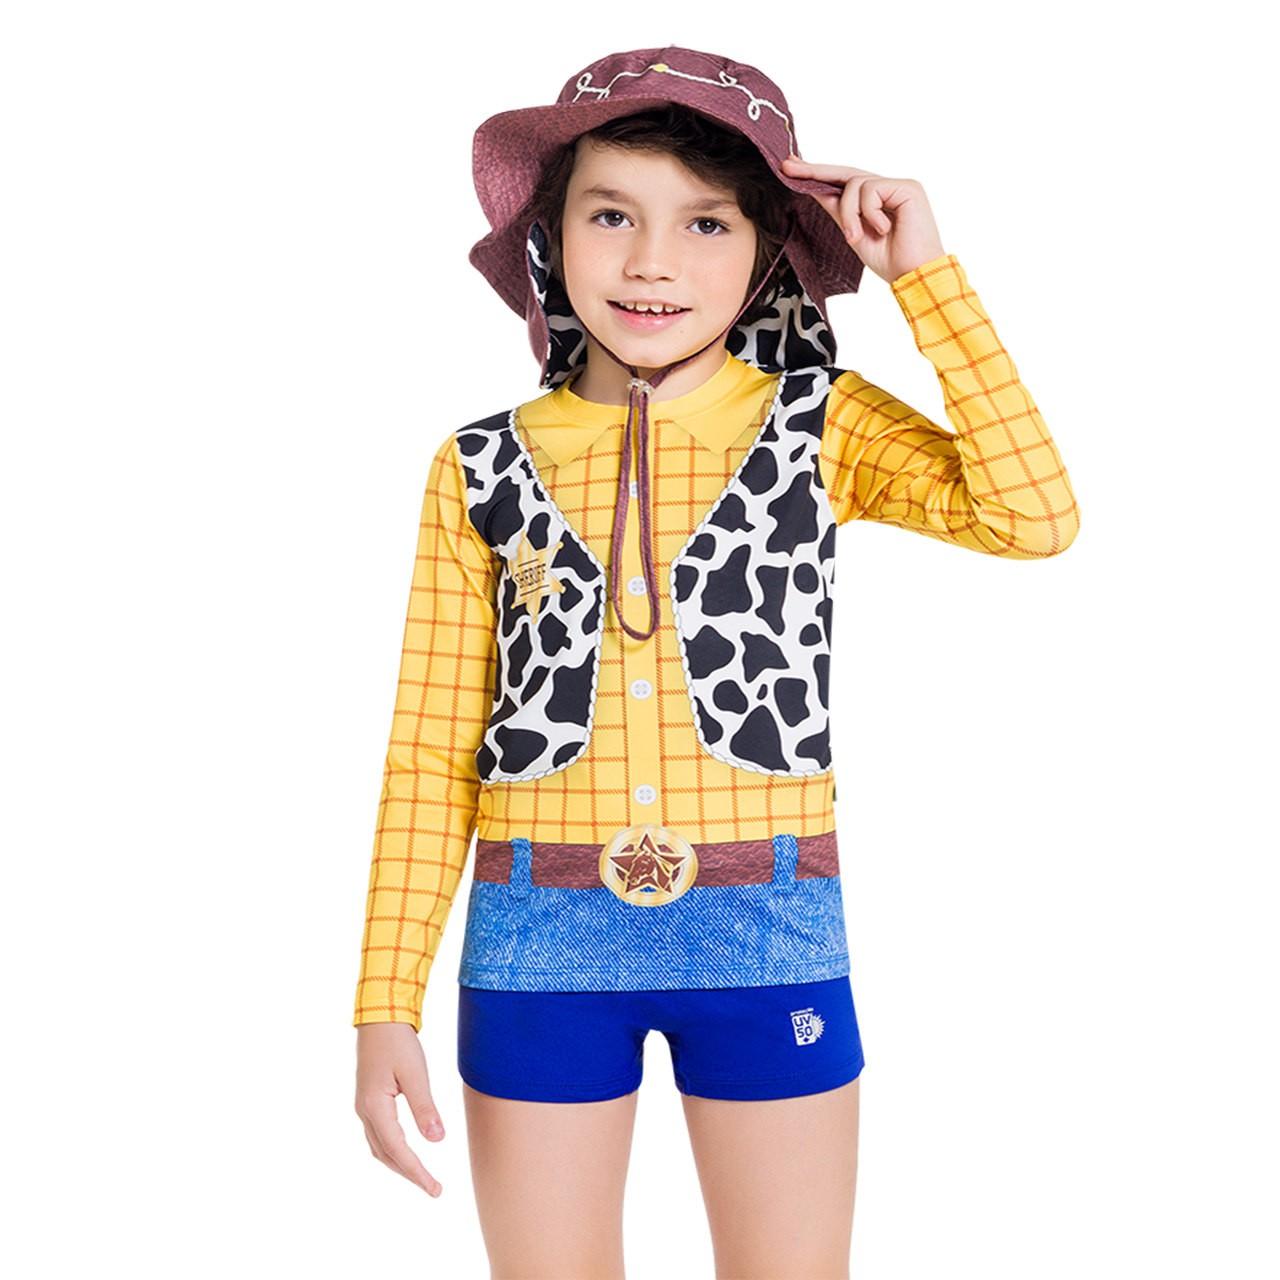 Blusa proteção solar infantil toy story menino woody